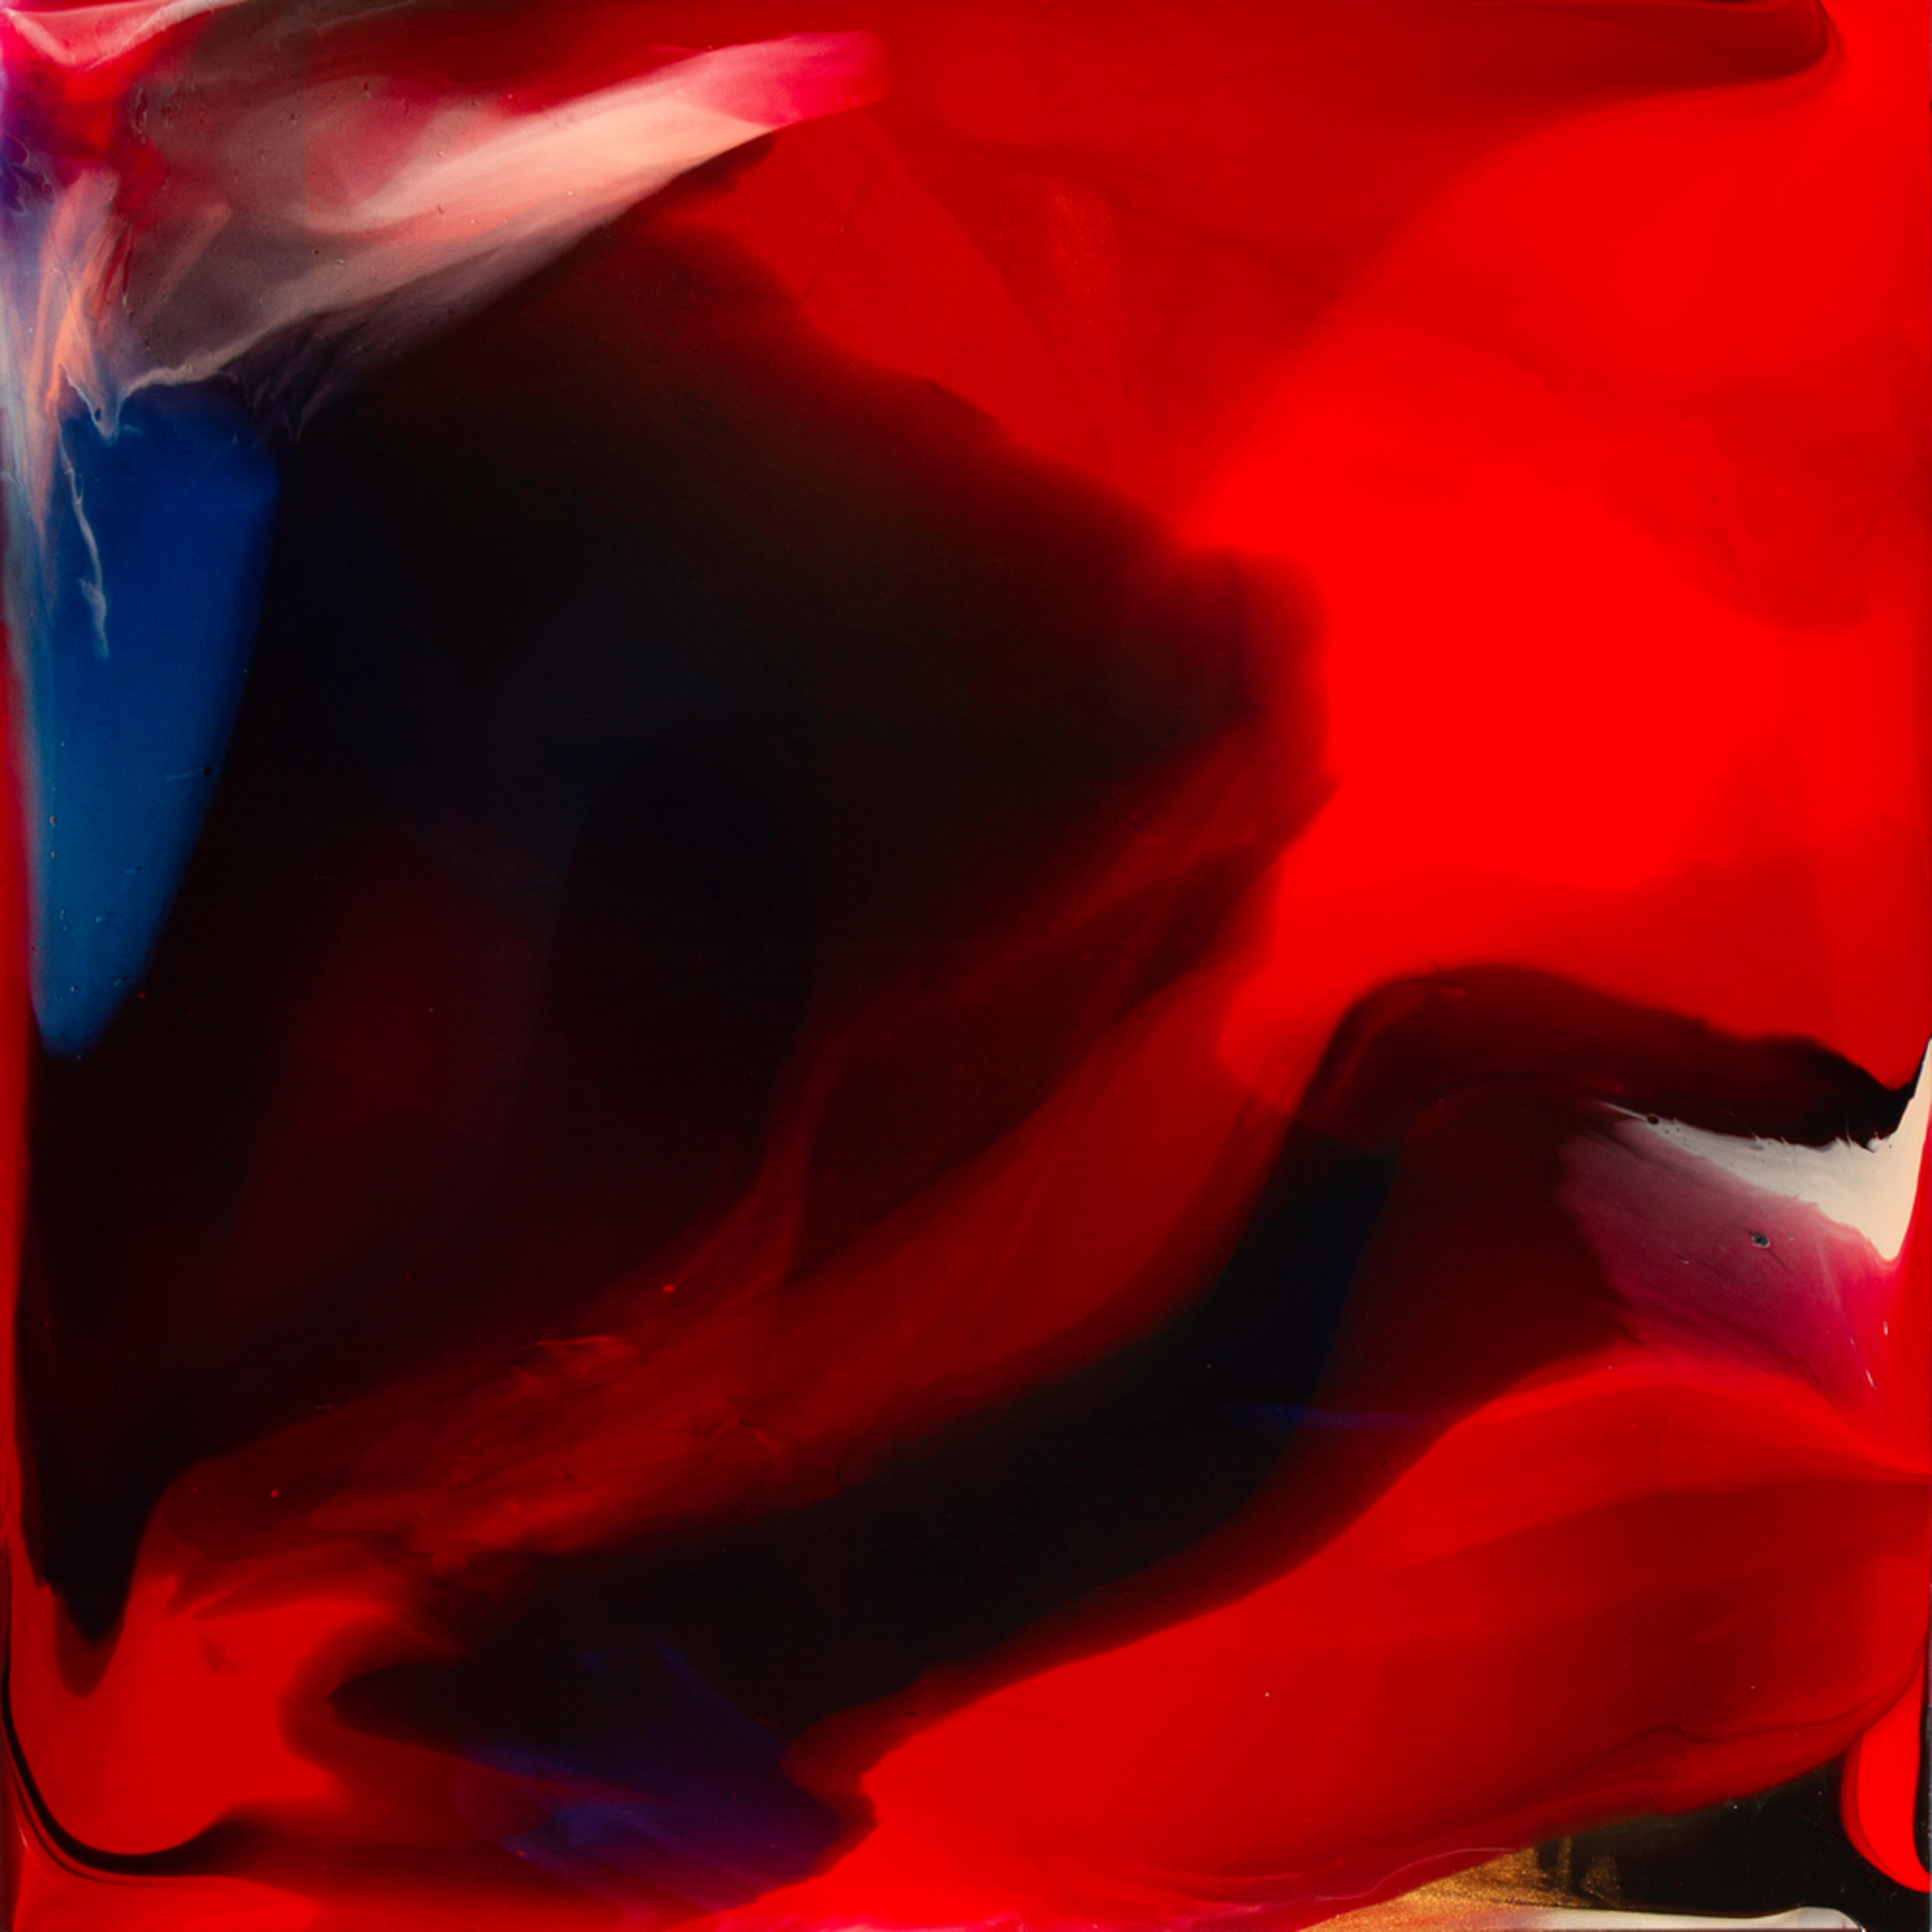 En rouge gpdfbp